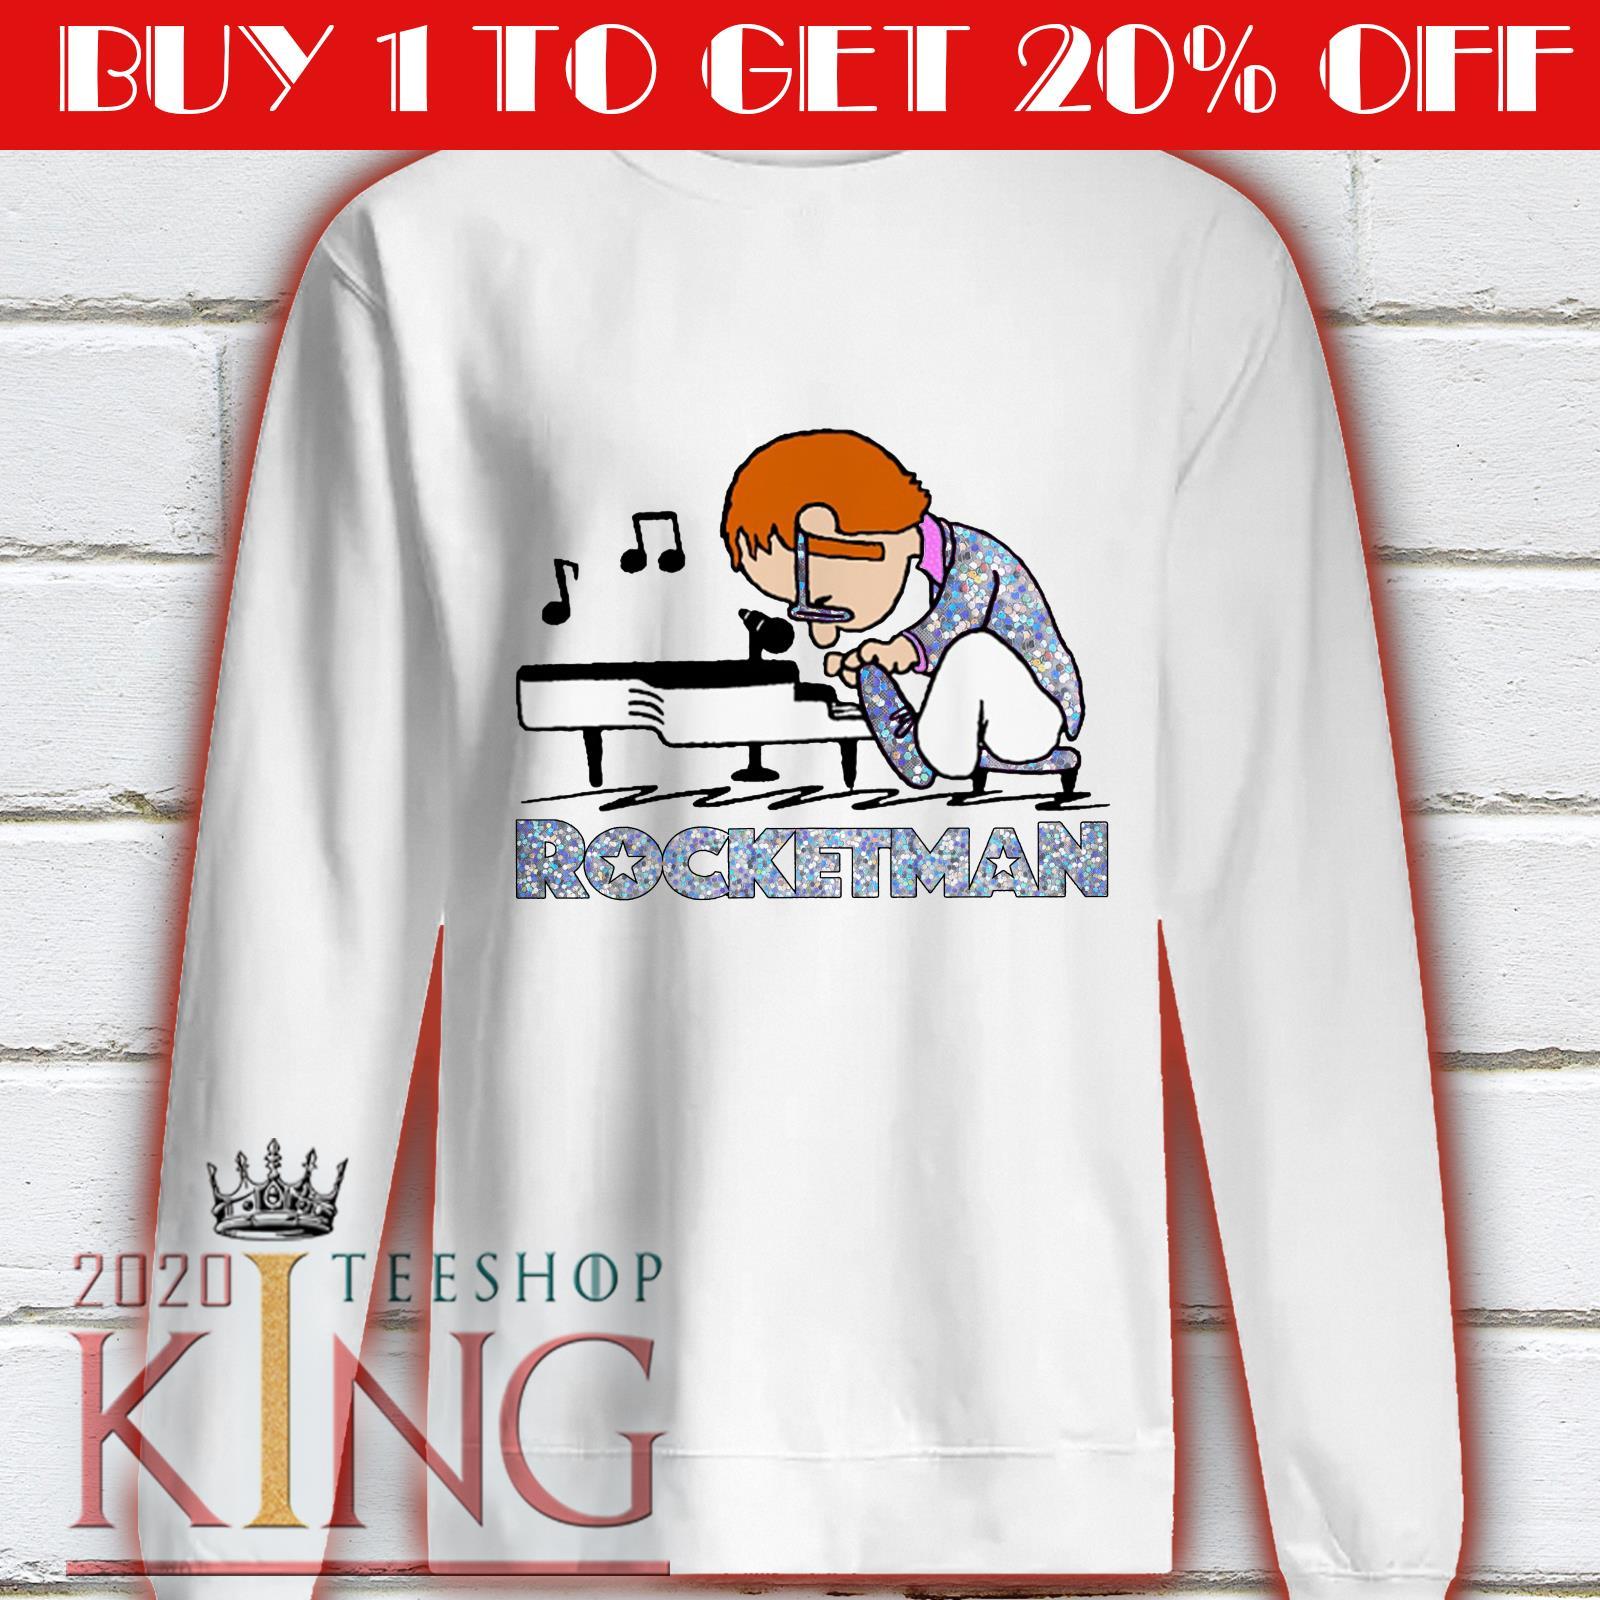 Elton John Playing Piano Rocketman shirt 1 Picturestees Clothing - T Shirt Printing on Demand